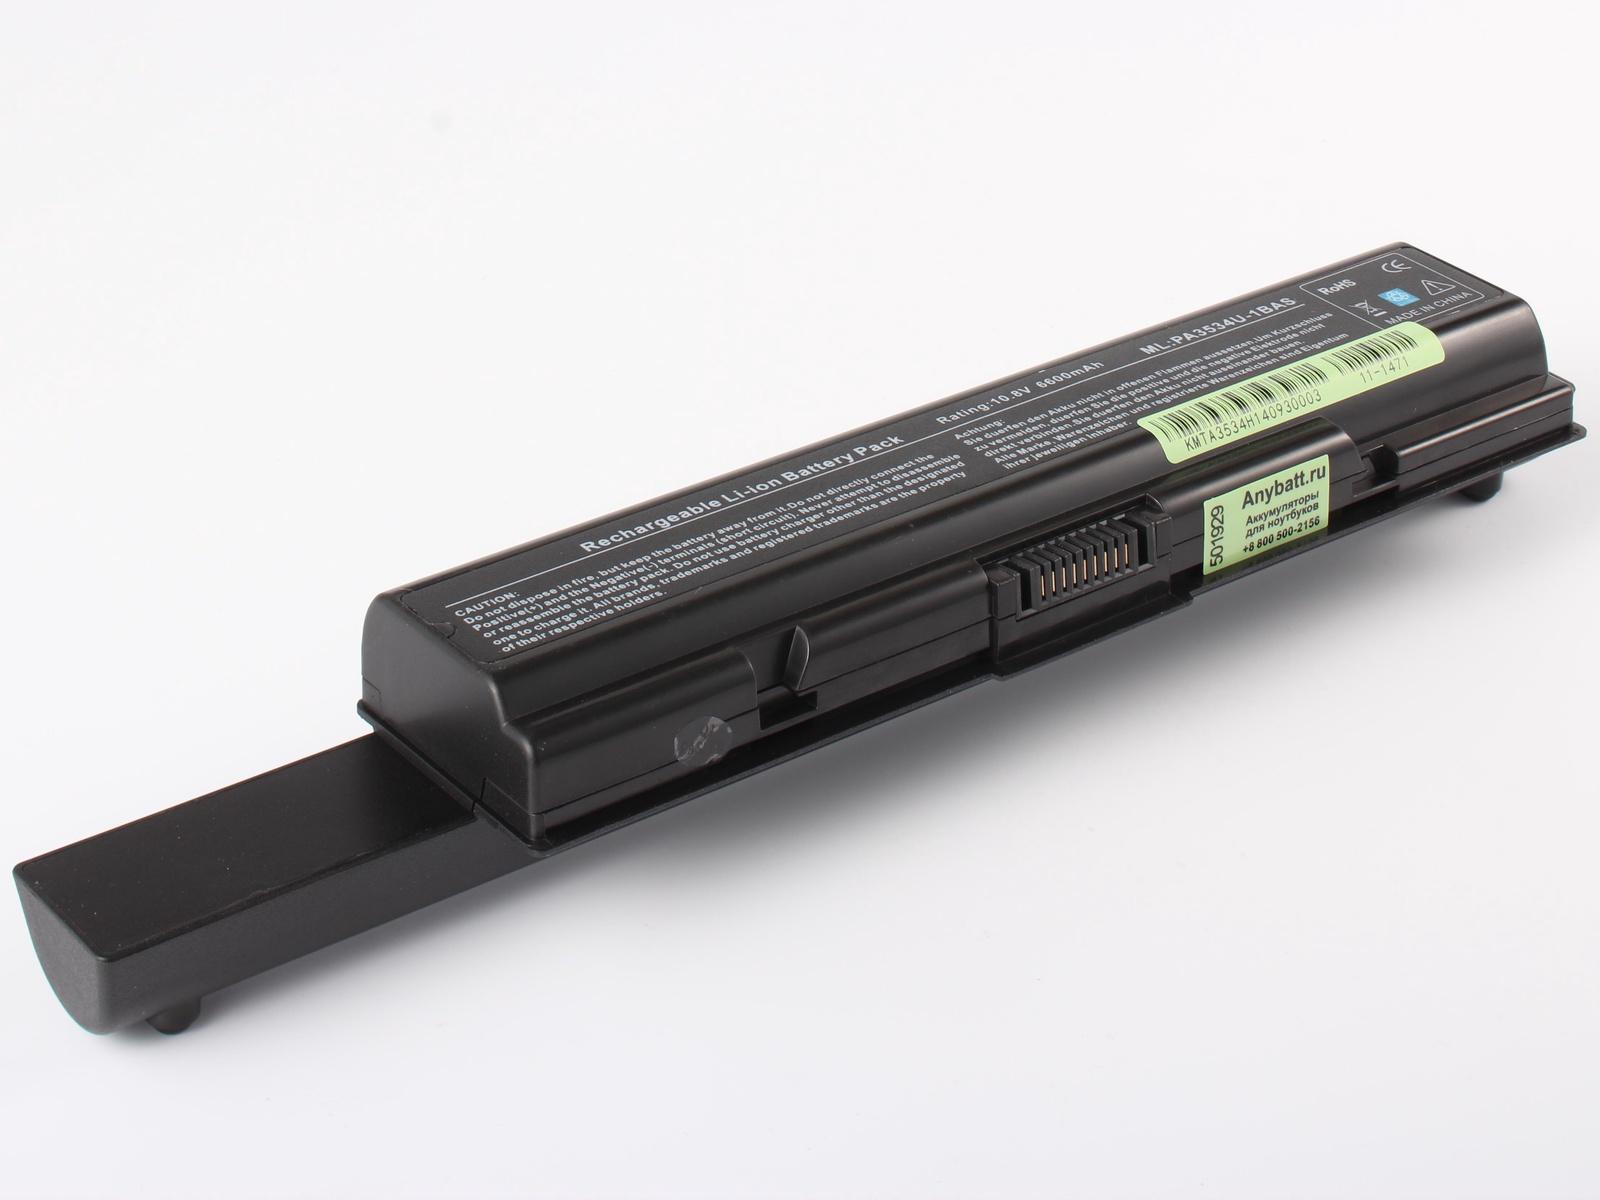 Аккумулятор для ноутбука AnyBatt для ToshiBa Satellite A300-20Q, Satellite L505-13T, Satellite A205, Satellite A300-149, Satellite A300-15J, Satellite A215, Satellite A305, Satellite L300-1A2, Satellite A200-1N1 цены онлайн